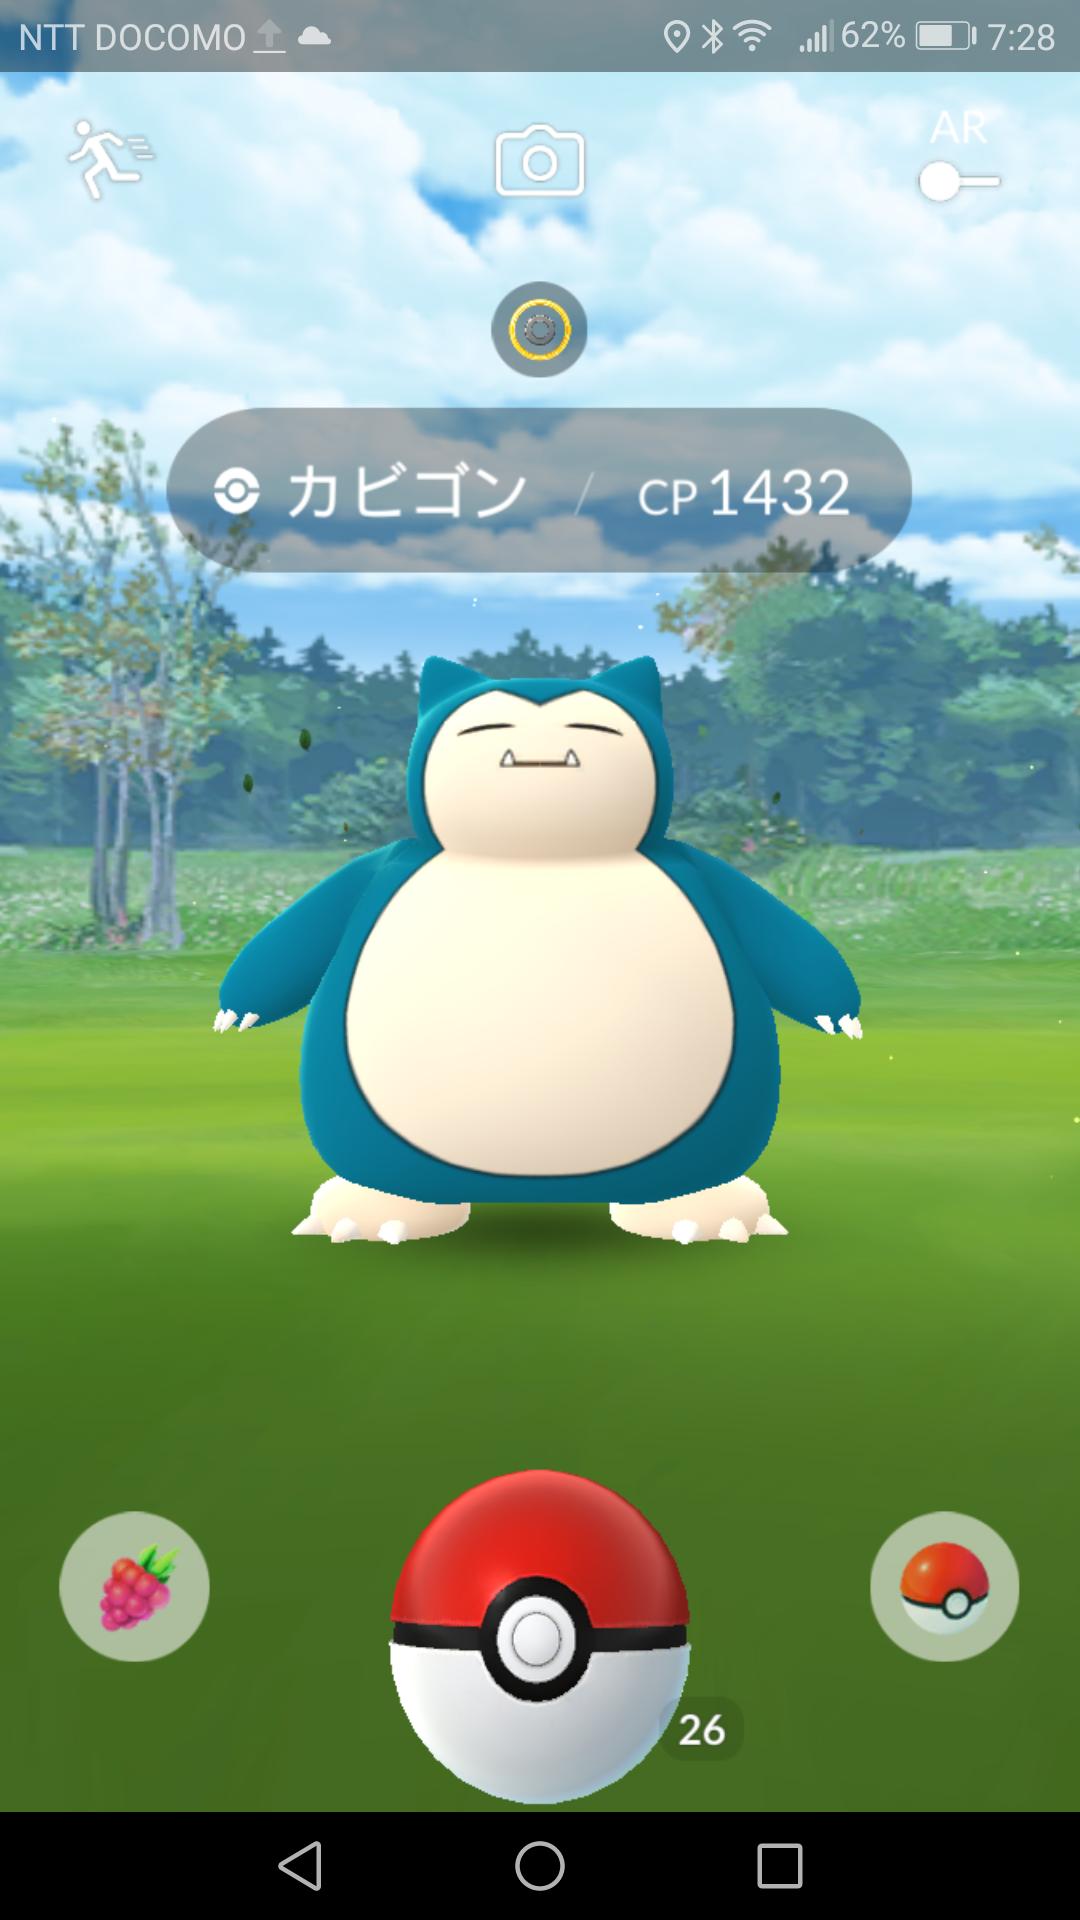 Go 個体 値 ハイパー リーグ ポケモン